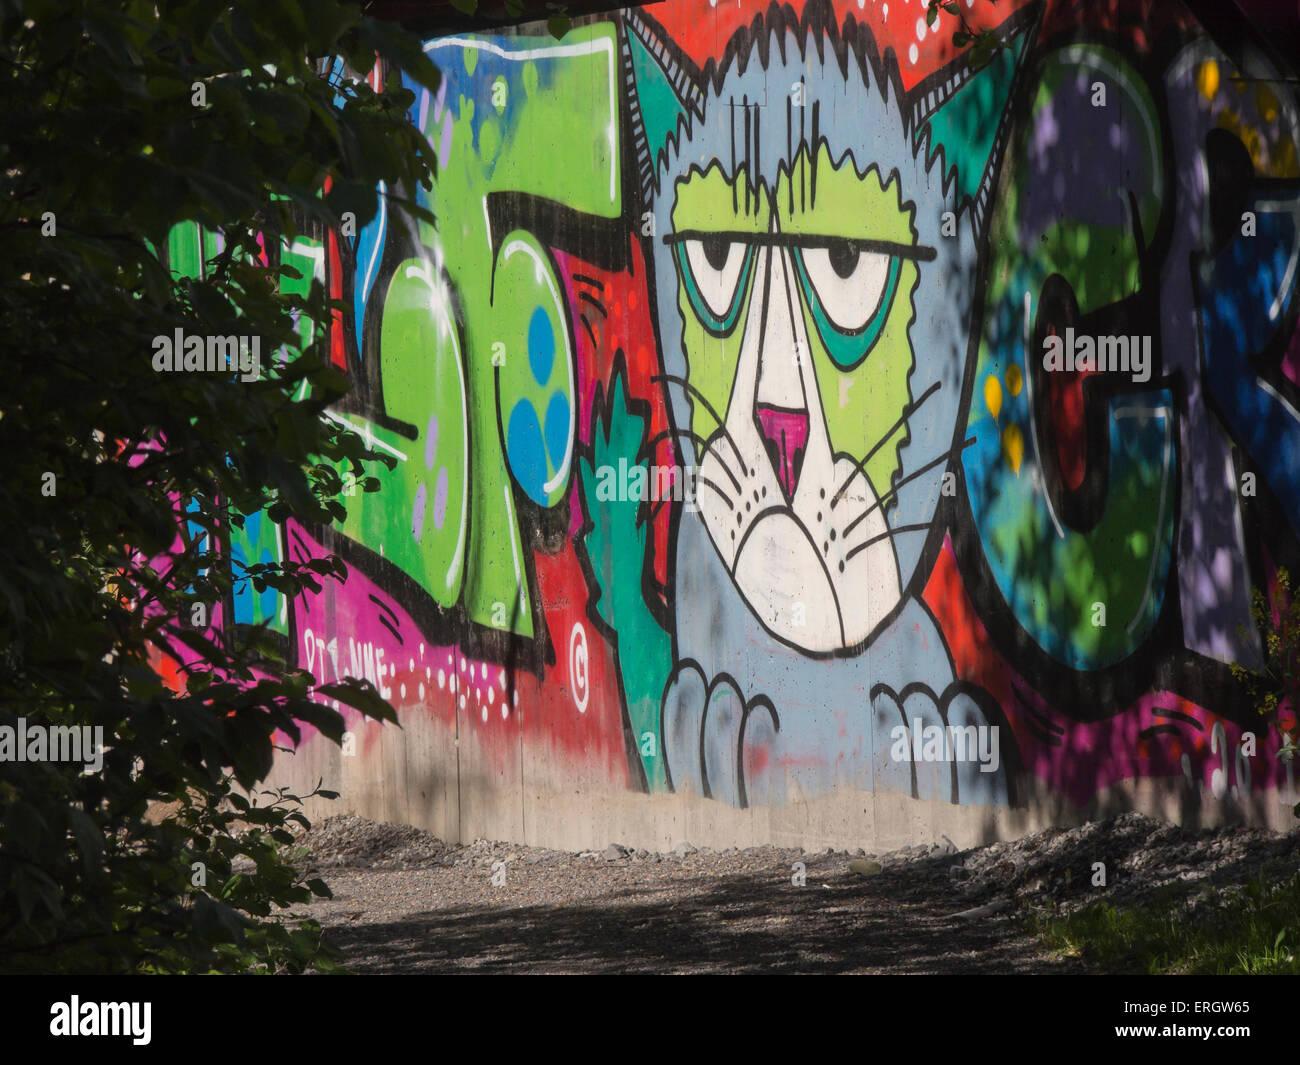 Grafitti art oslo - Street Art Graffiti Miserable Looking Cat With Colourful Letters A Decorative Concrete Wall